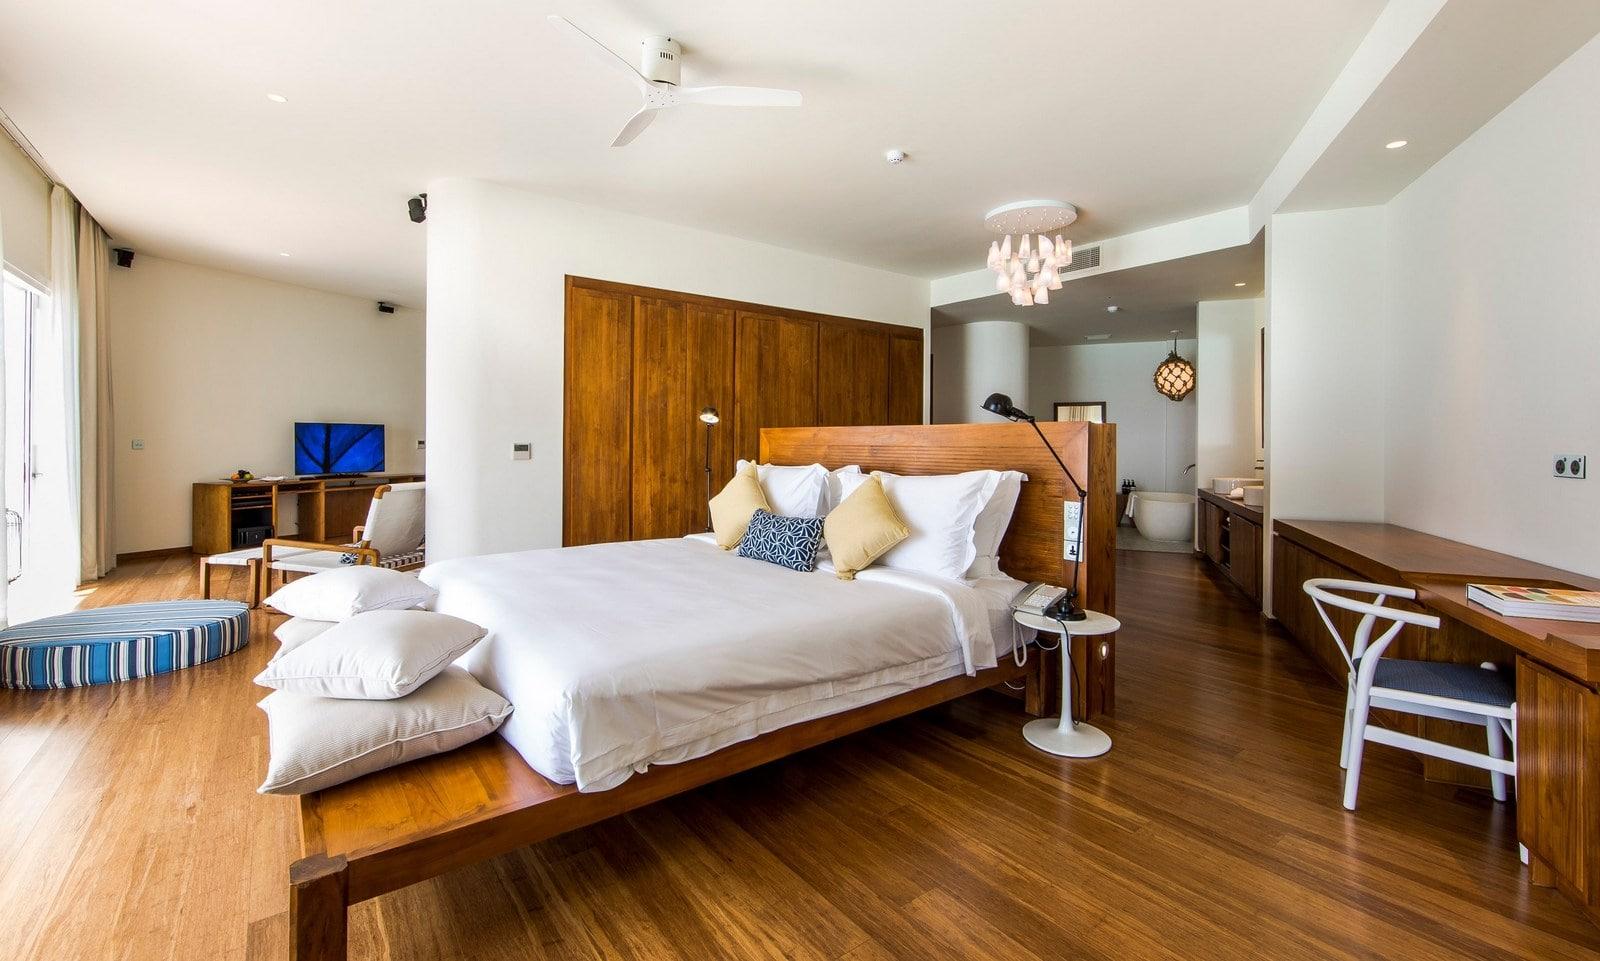 Мальдивы, Отель Amilla Fushi Maldives, номер 2-Bedroom Lagoon Water Pool Villa